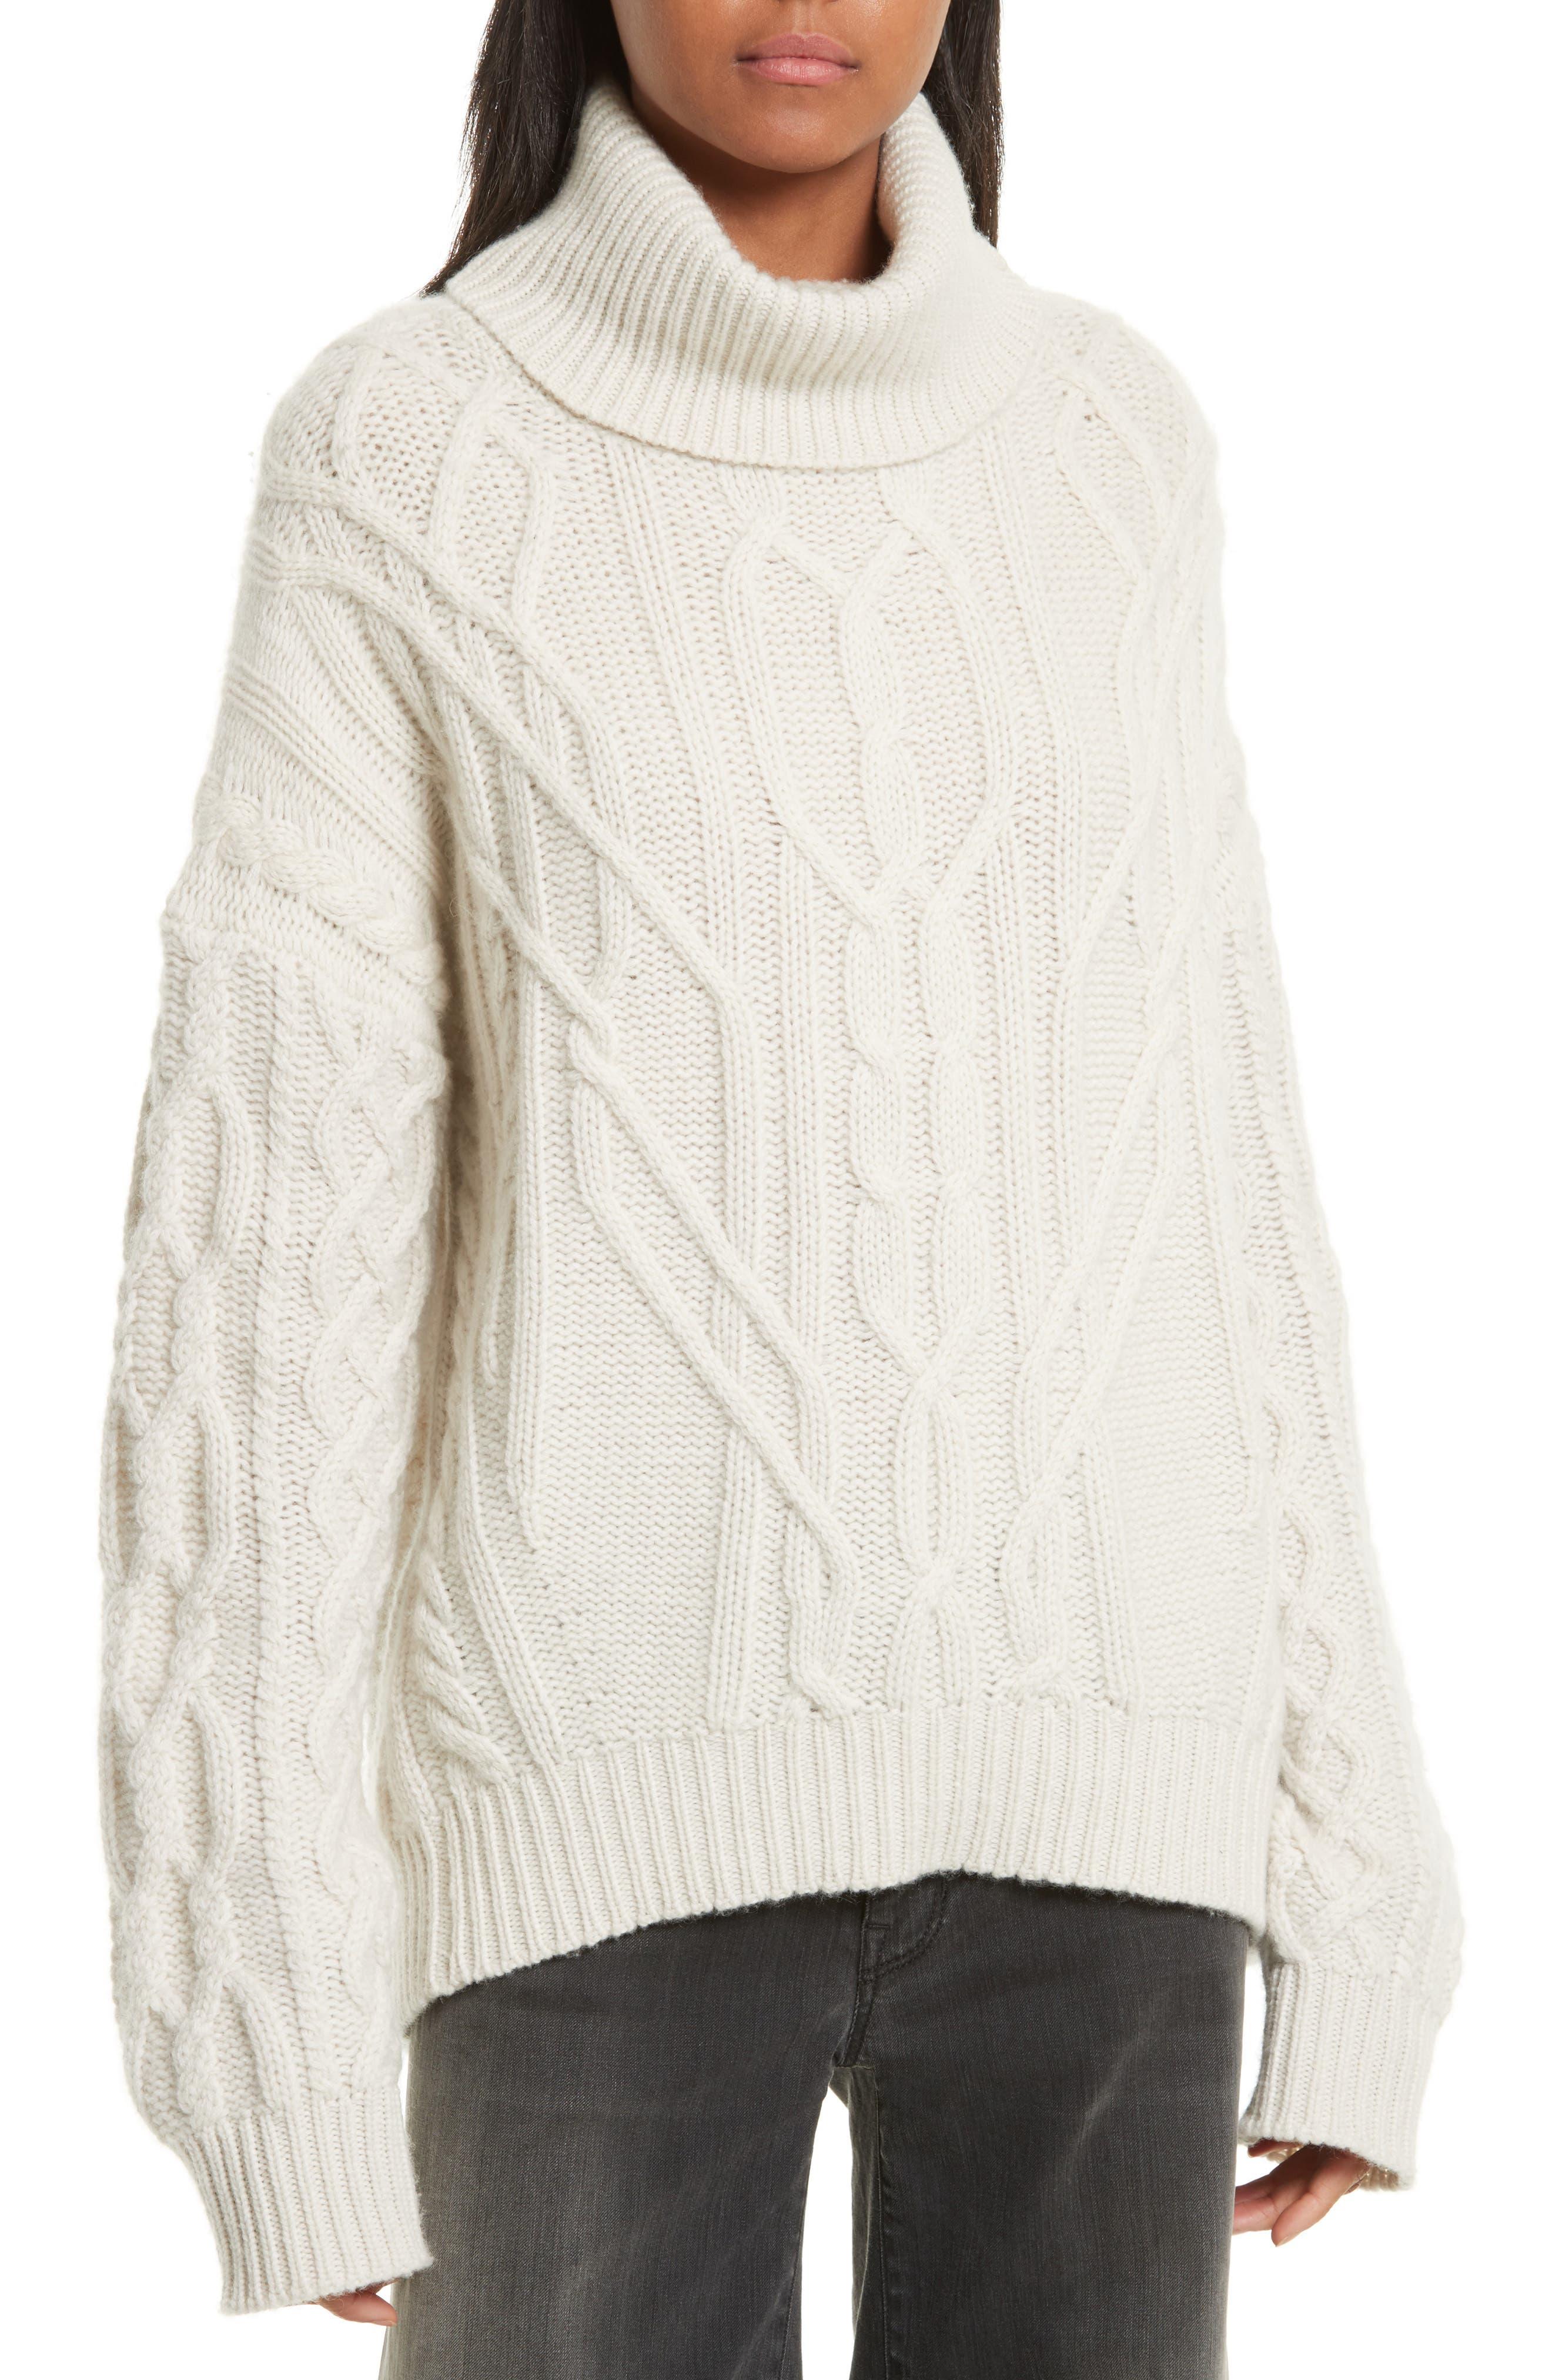 Main Image - Nili Lotan Cecil Cable Knit Cashmere Turtleneck Sweater